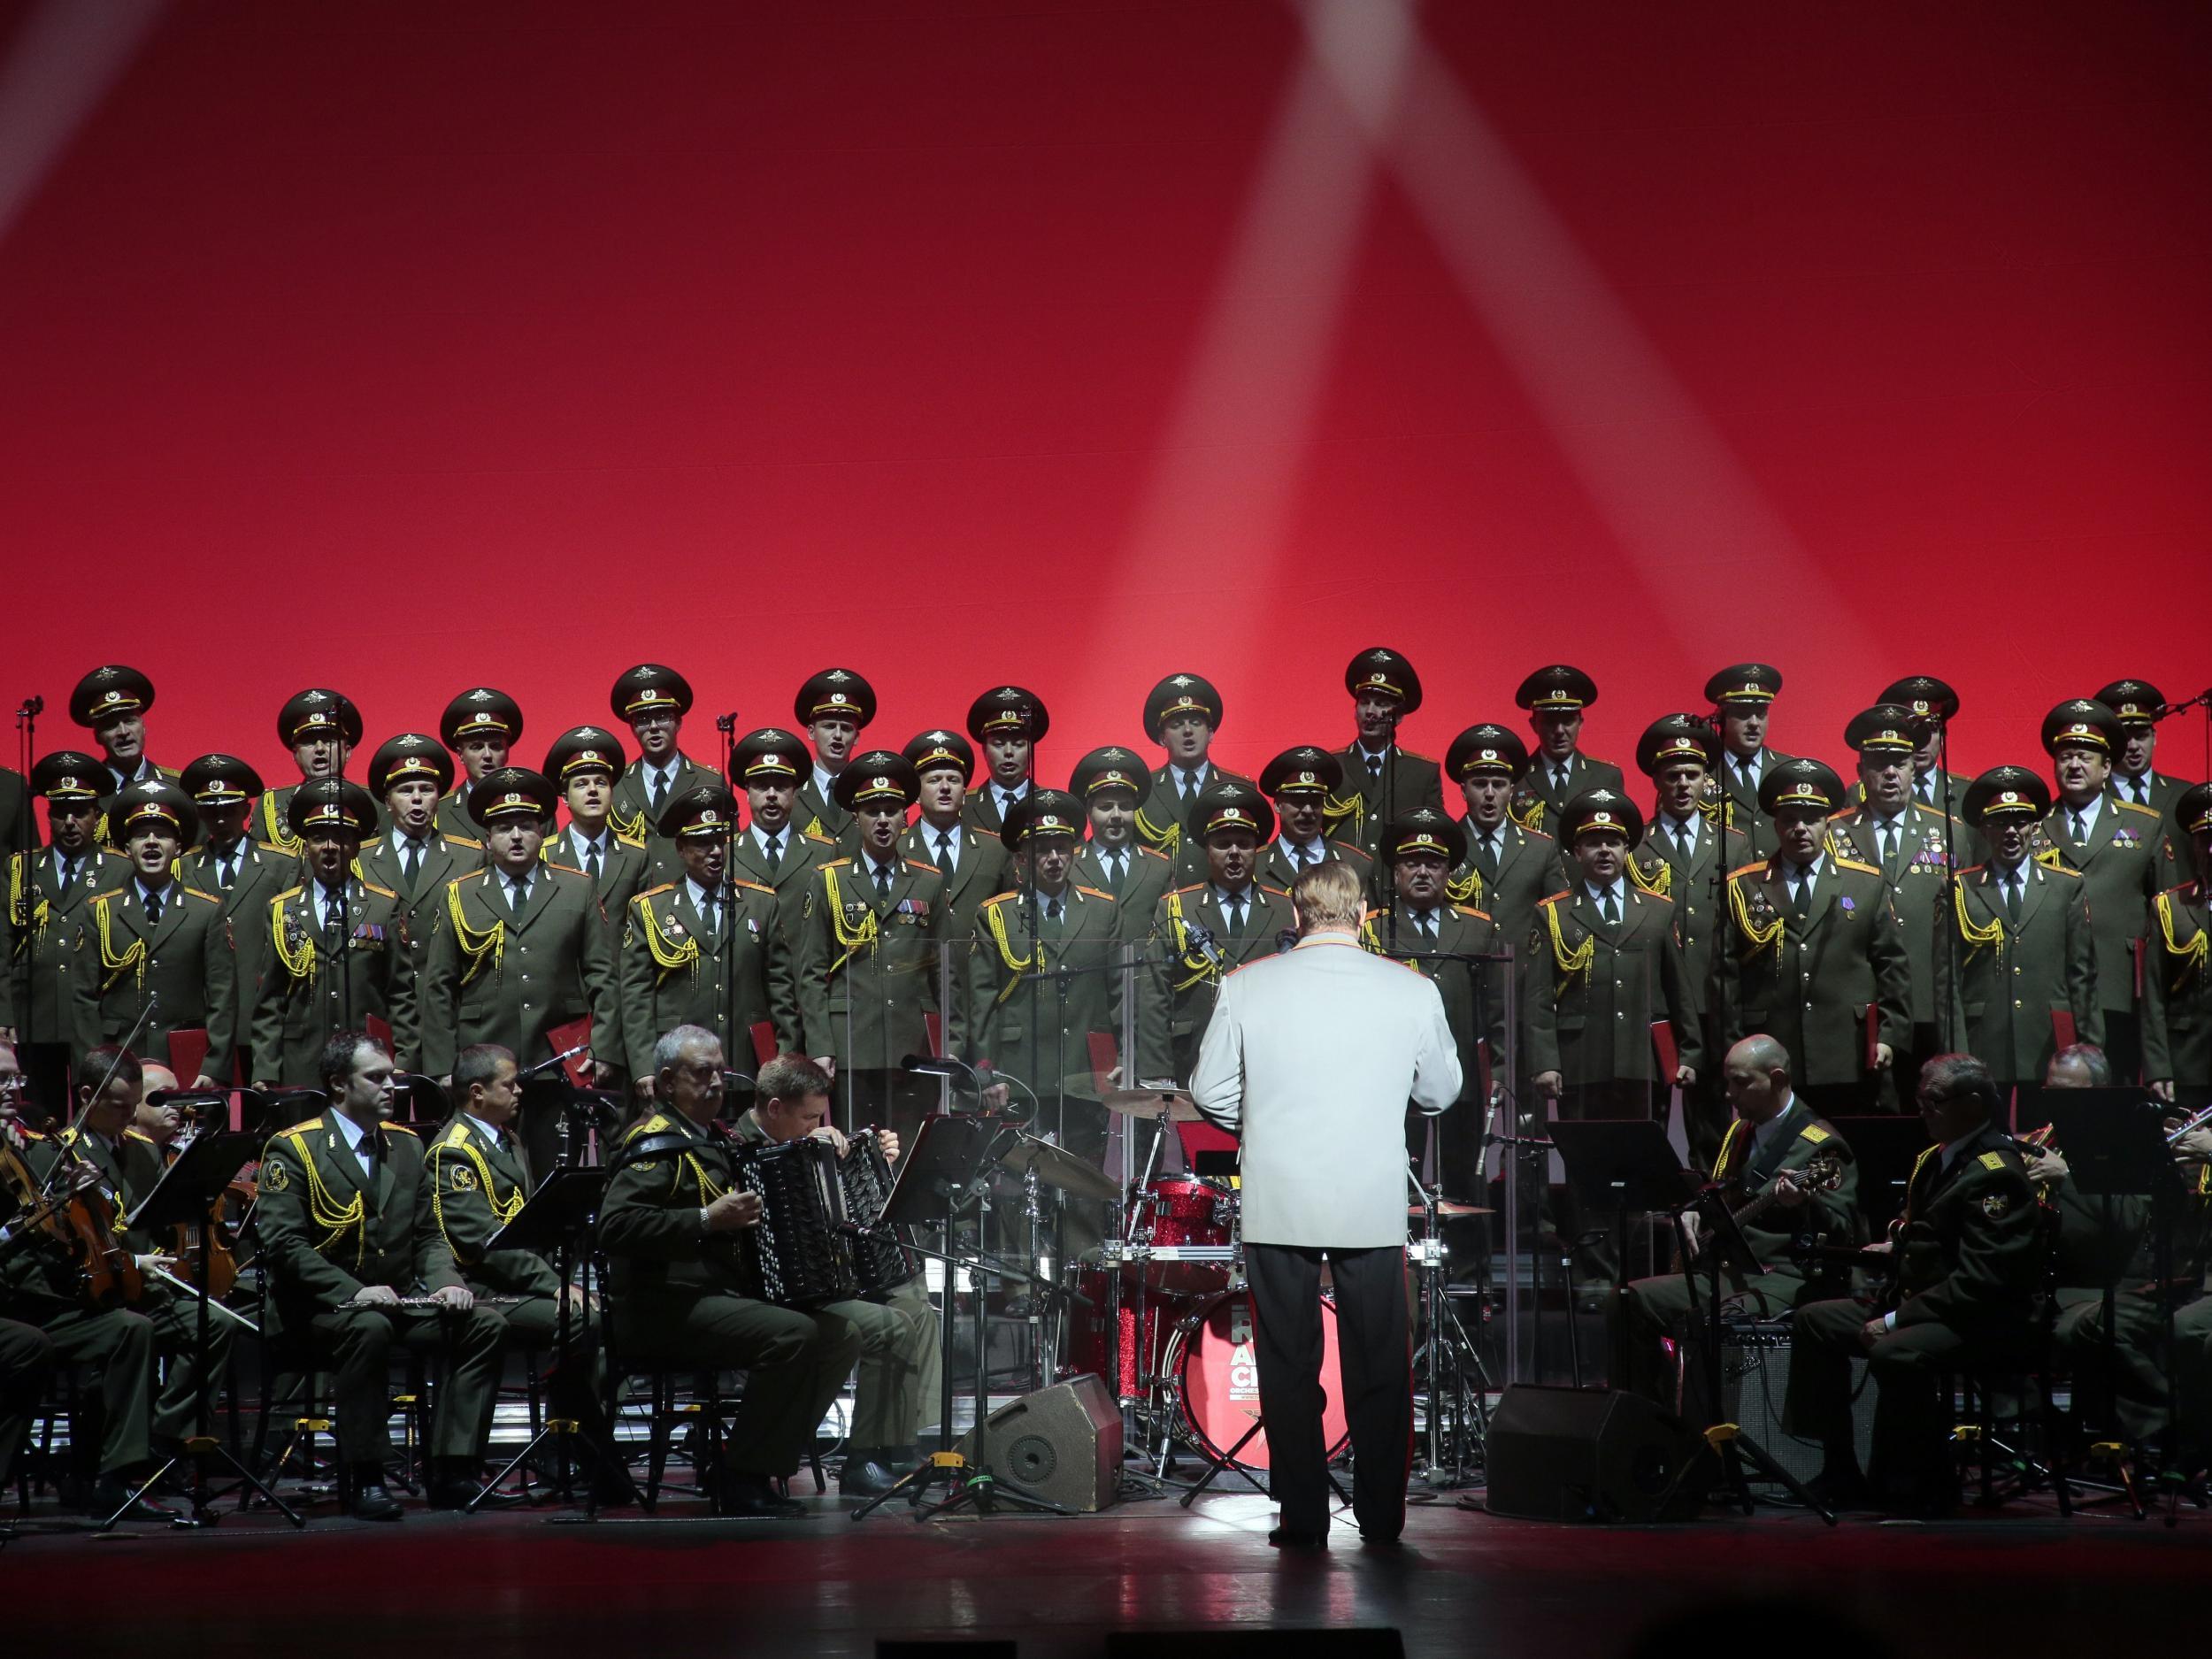 Where is Alexandrov 3